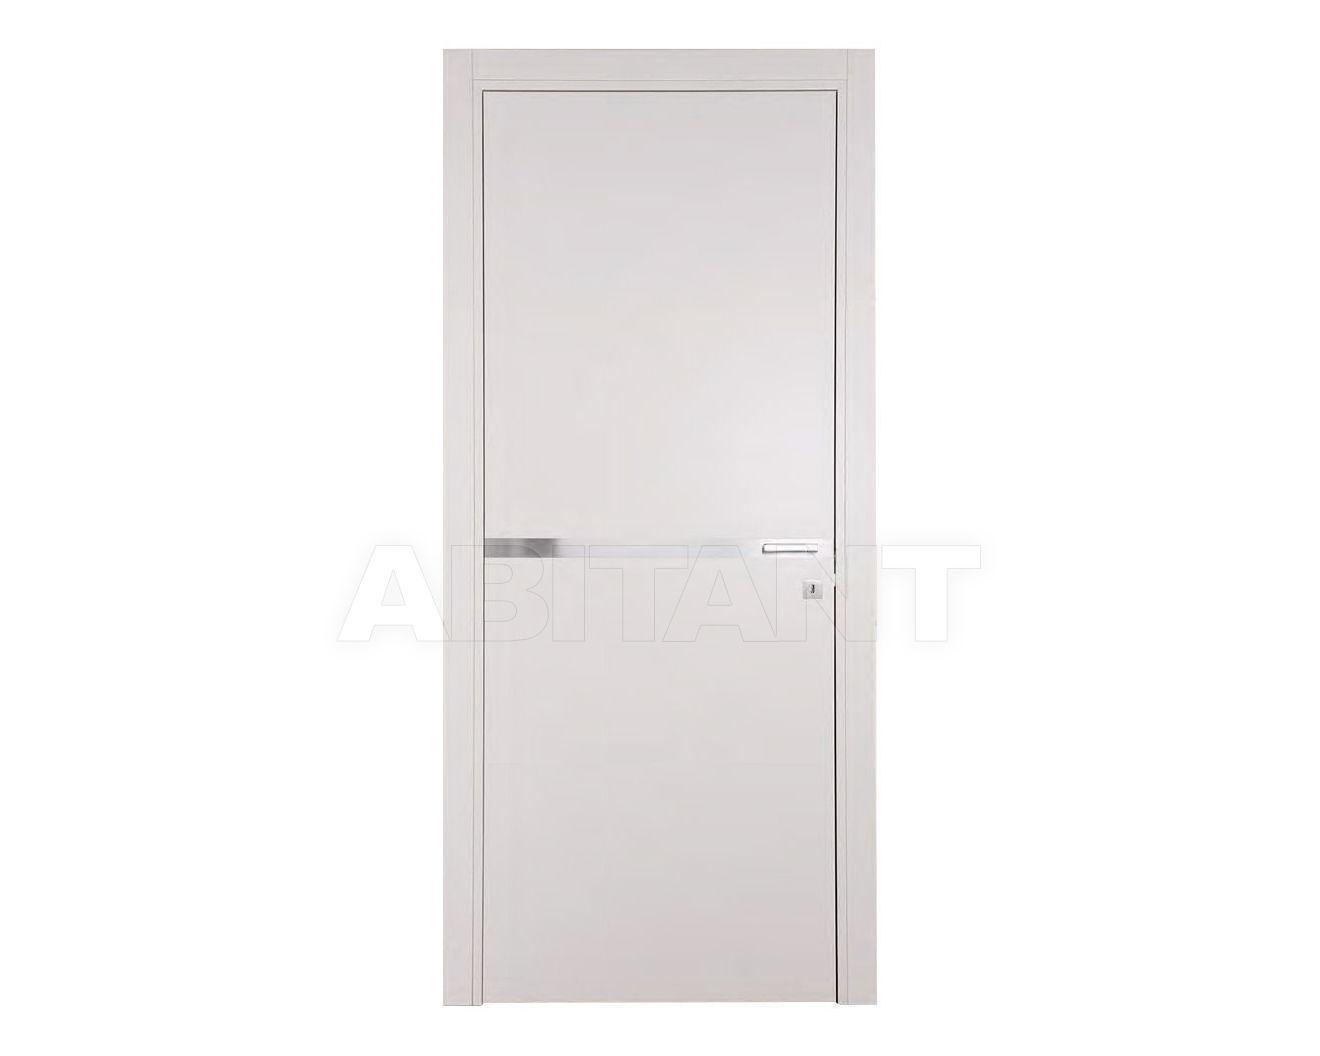 Купить Дверь деревянная Fioravazzi Lisce TRATTO A ROVERE LACCATO BIANCO